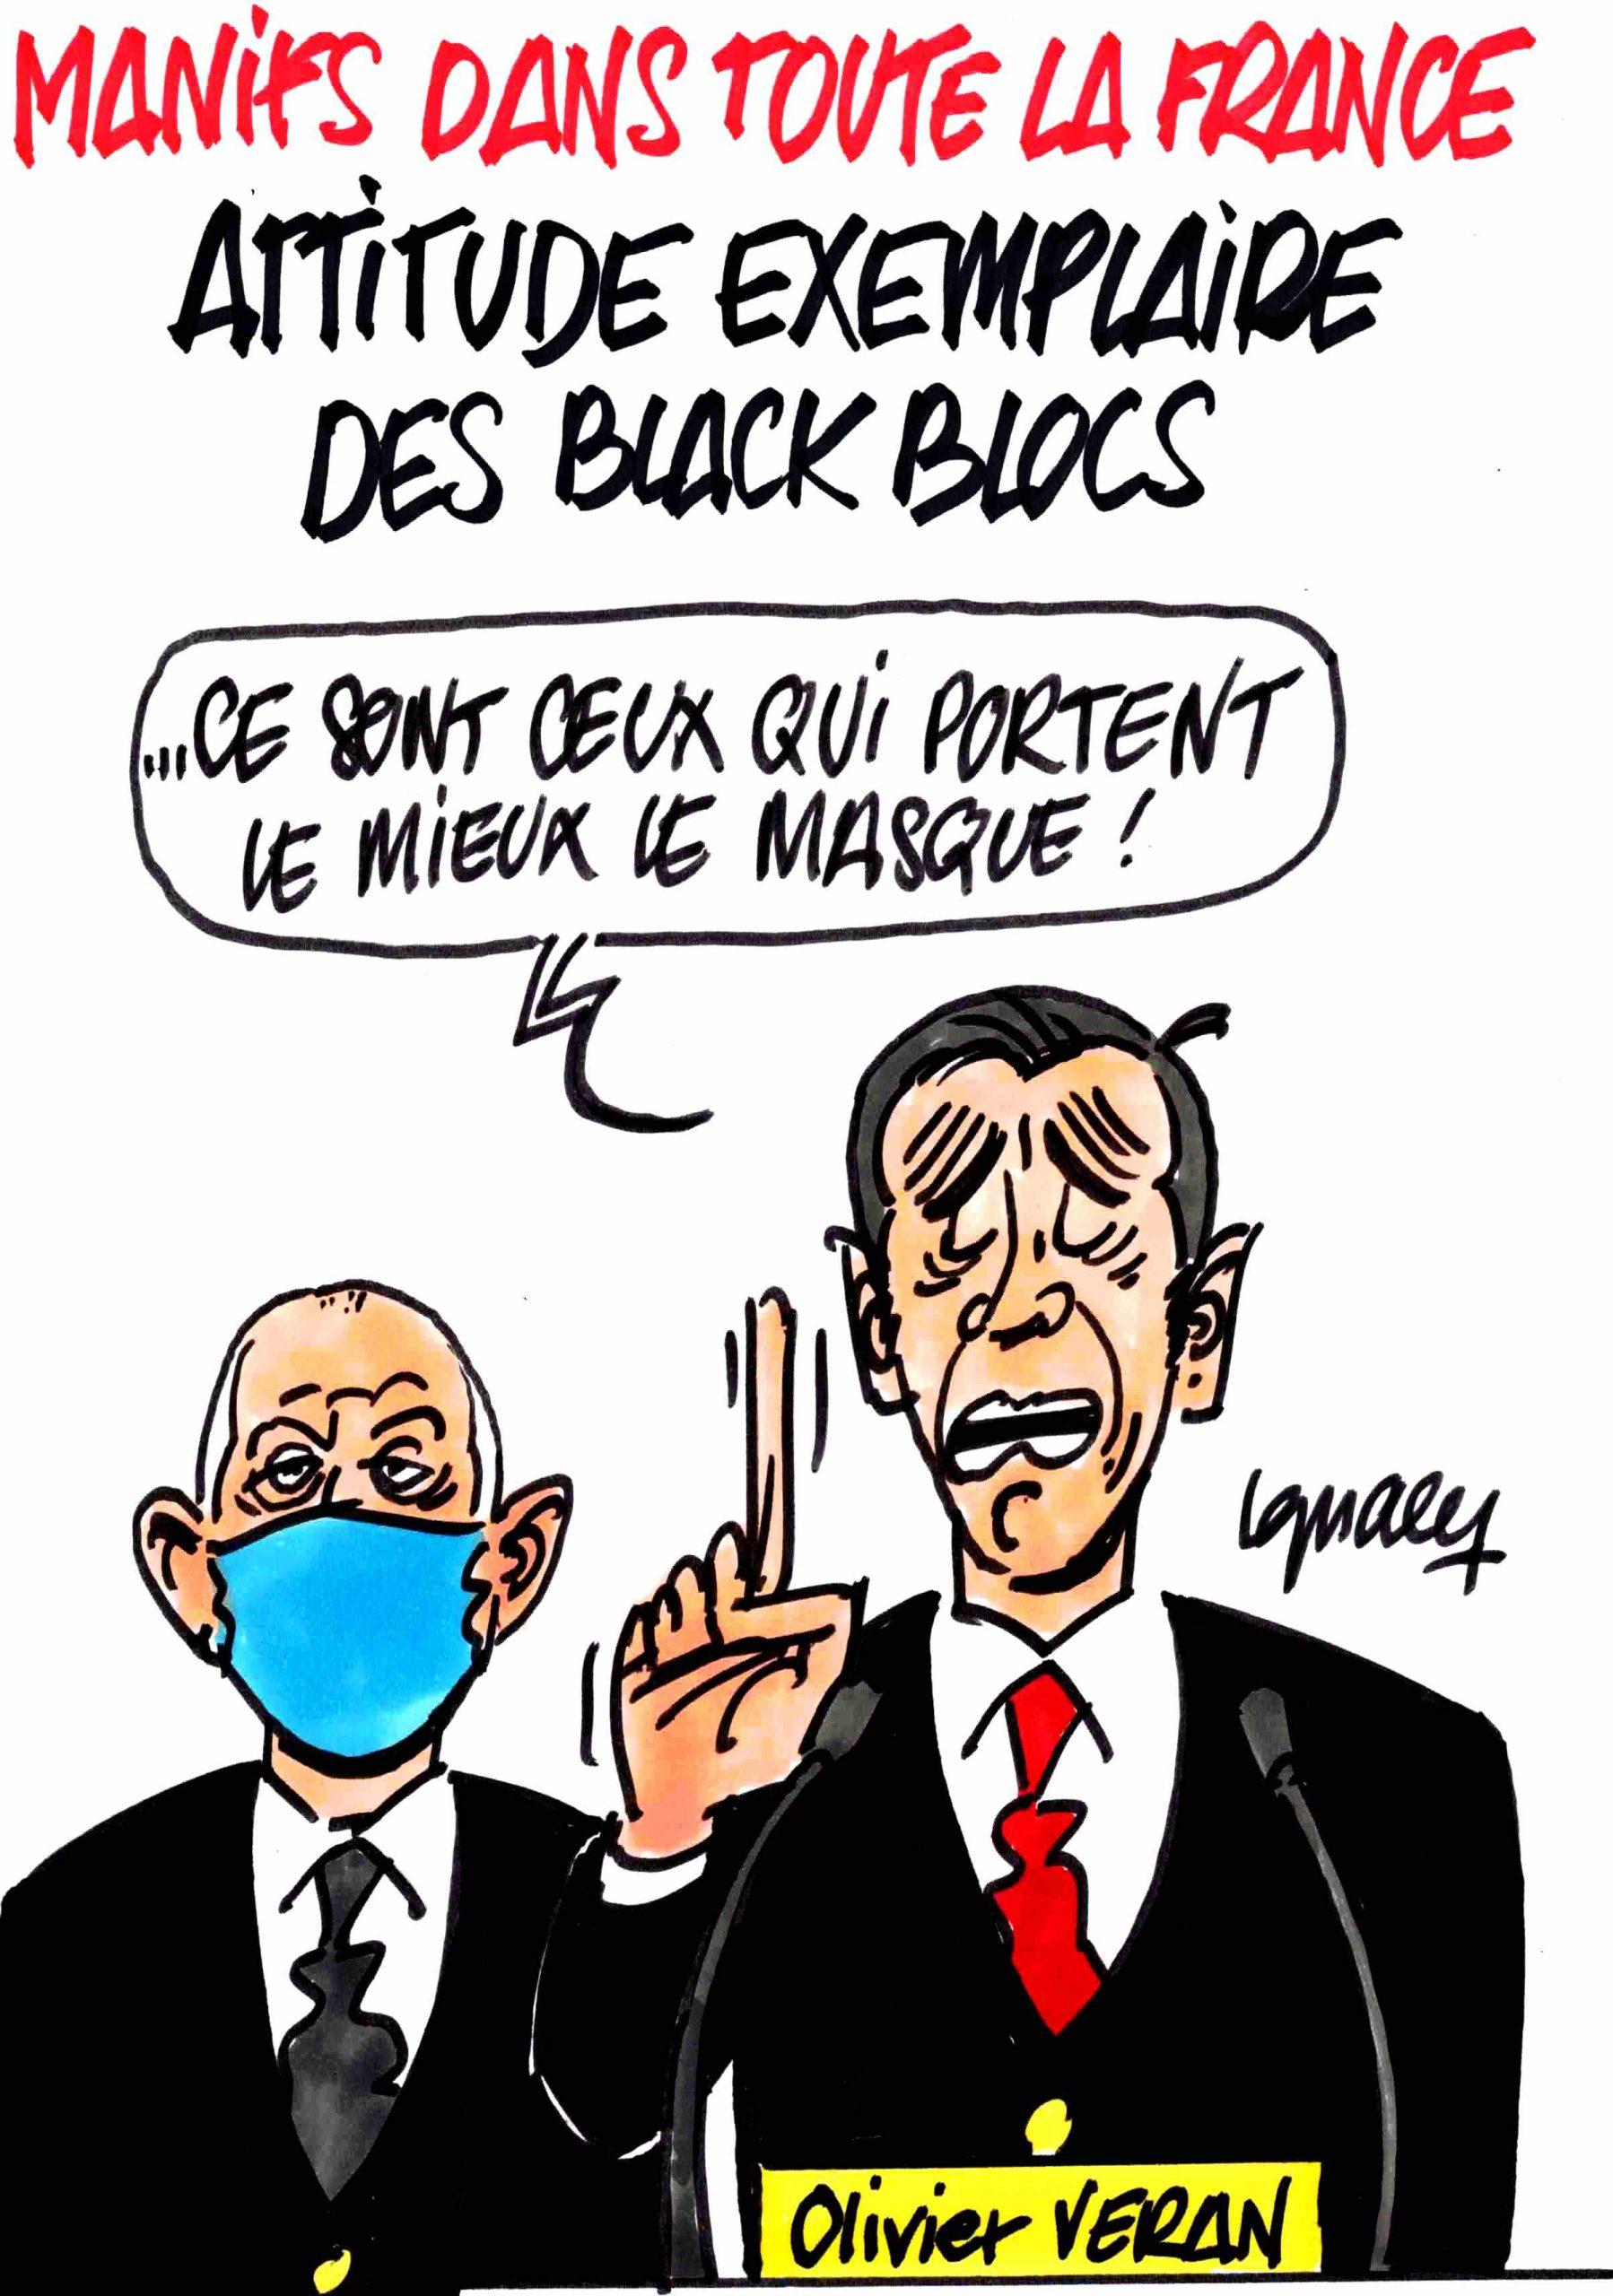 Ignace - La vertu des Black blocs